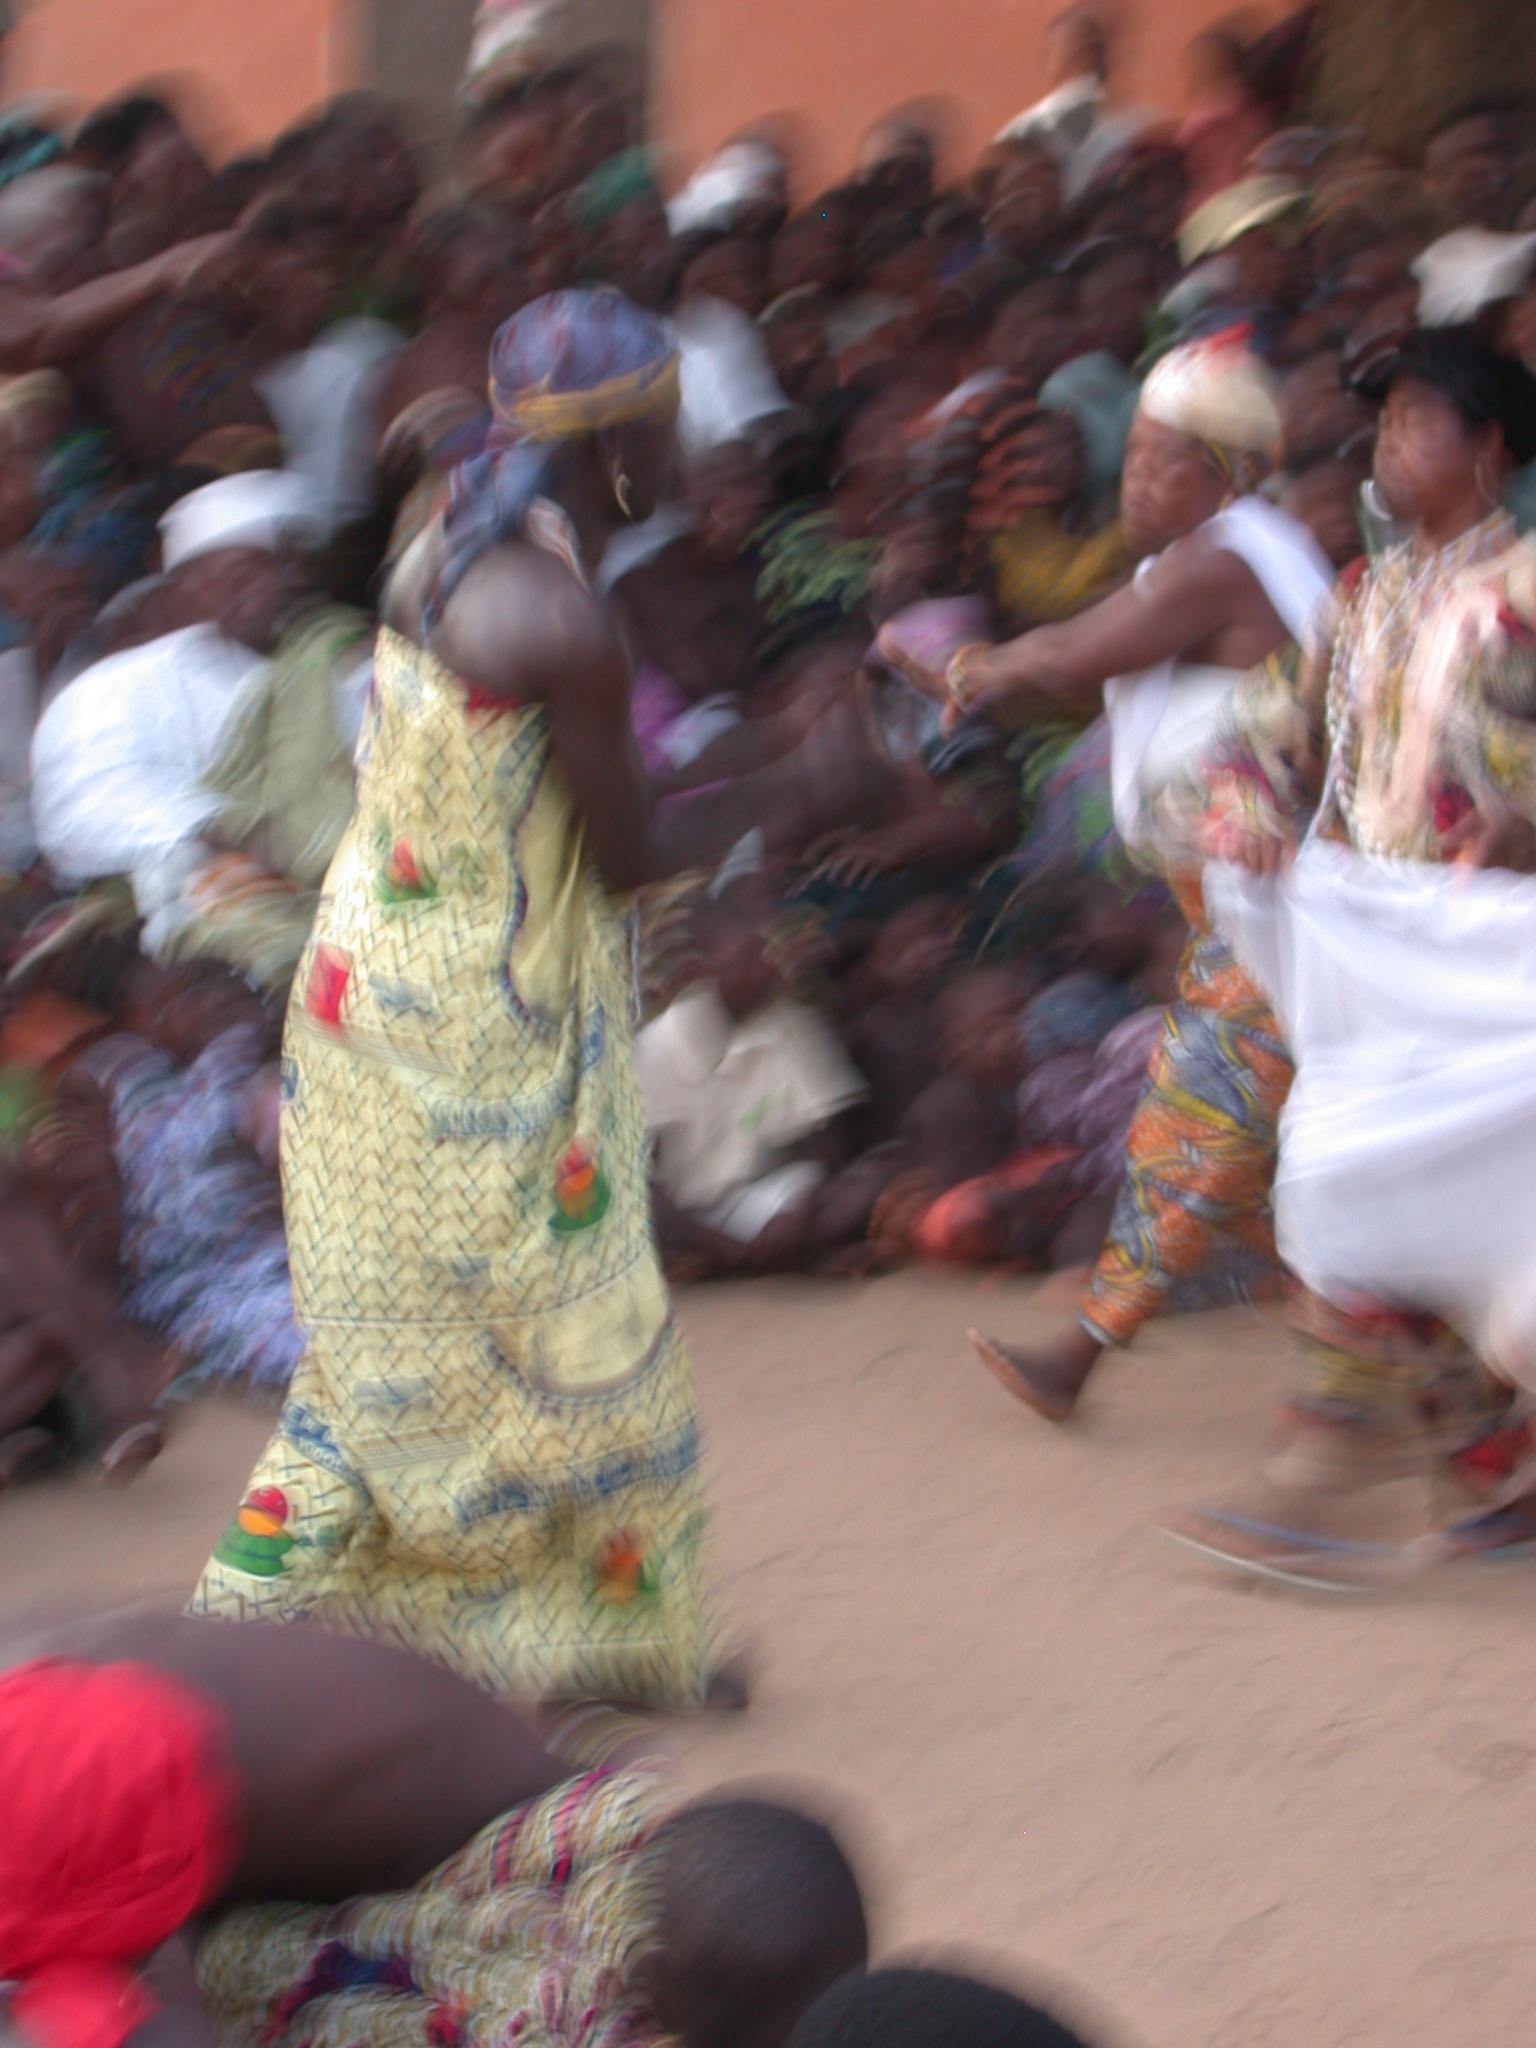 Assetive Dancing, Vodun Ritual, Ouidah, Benin